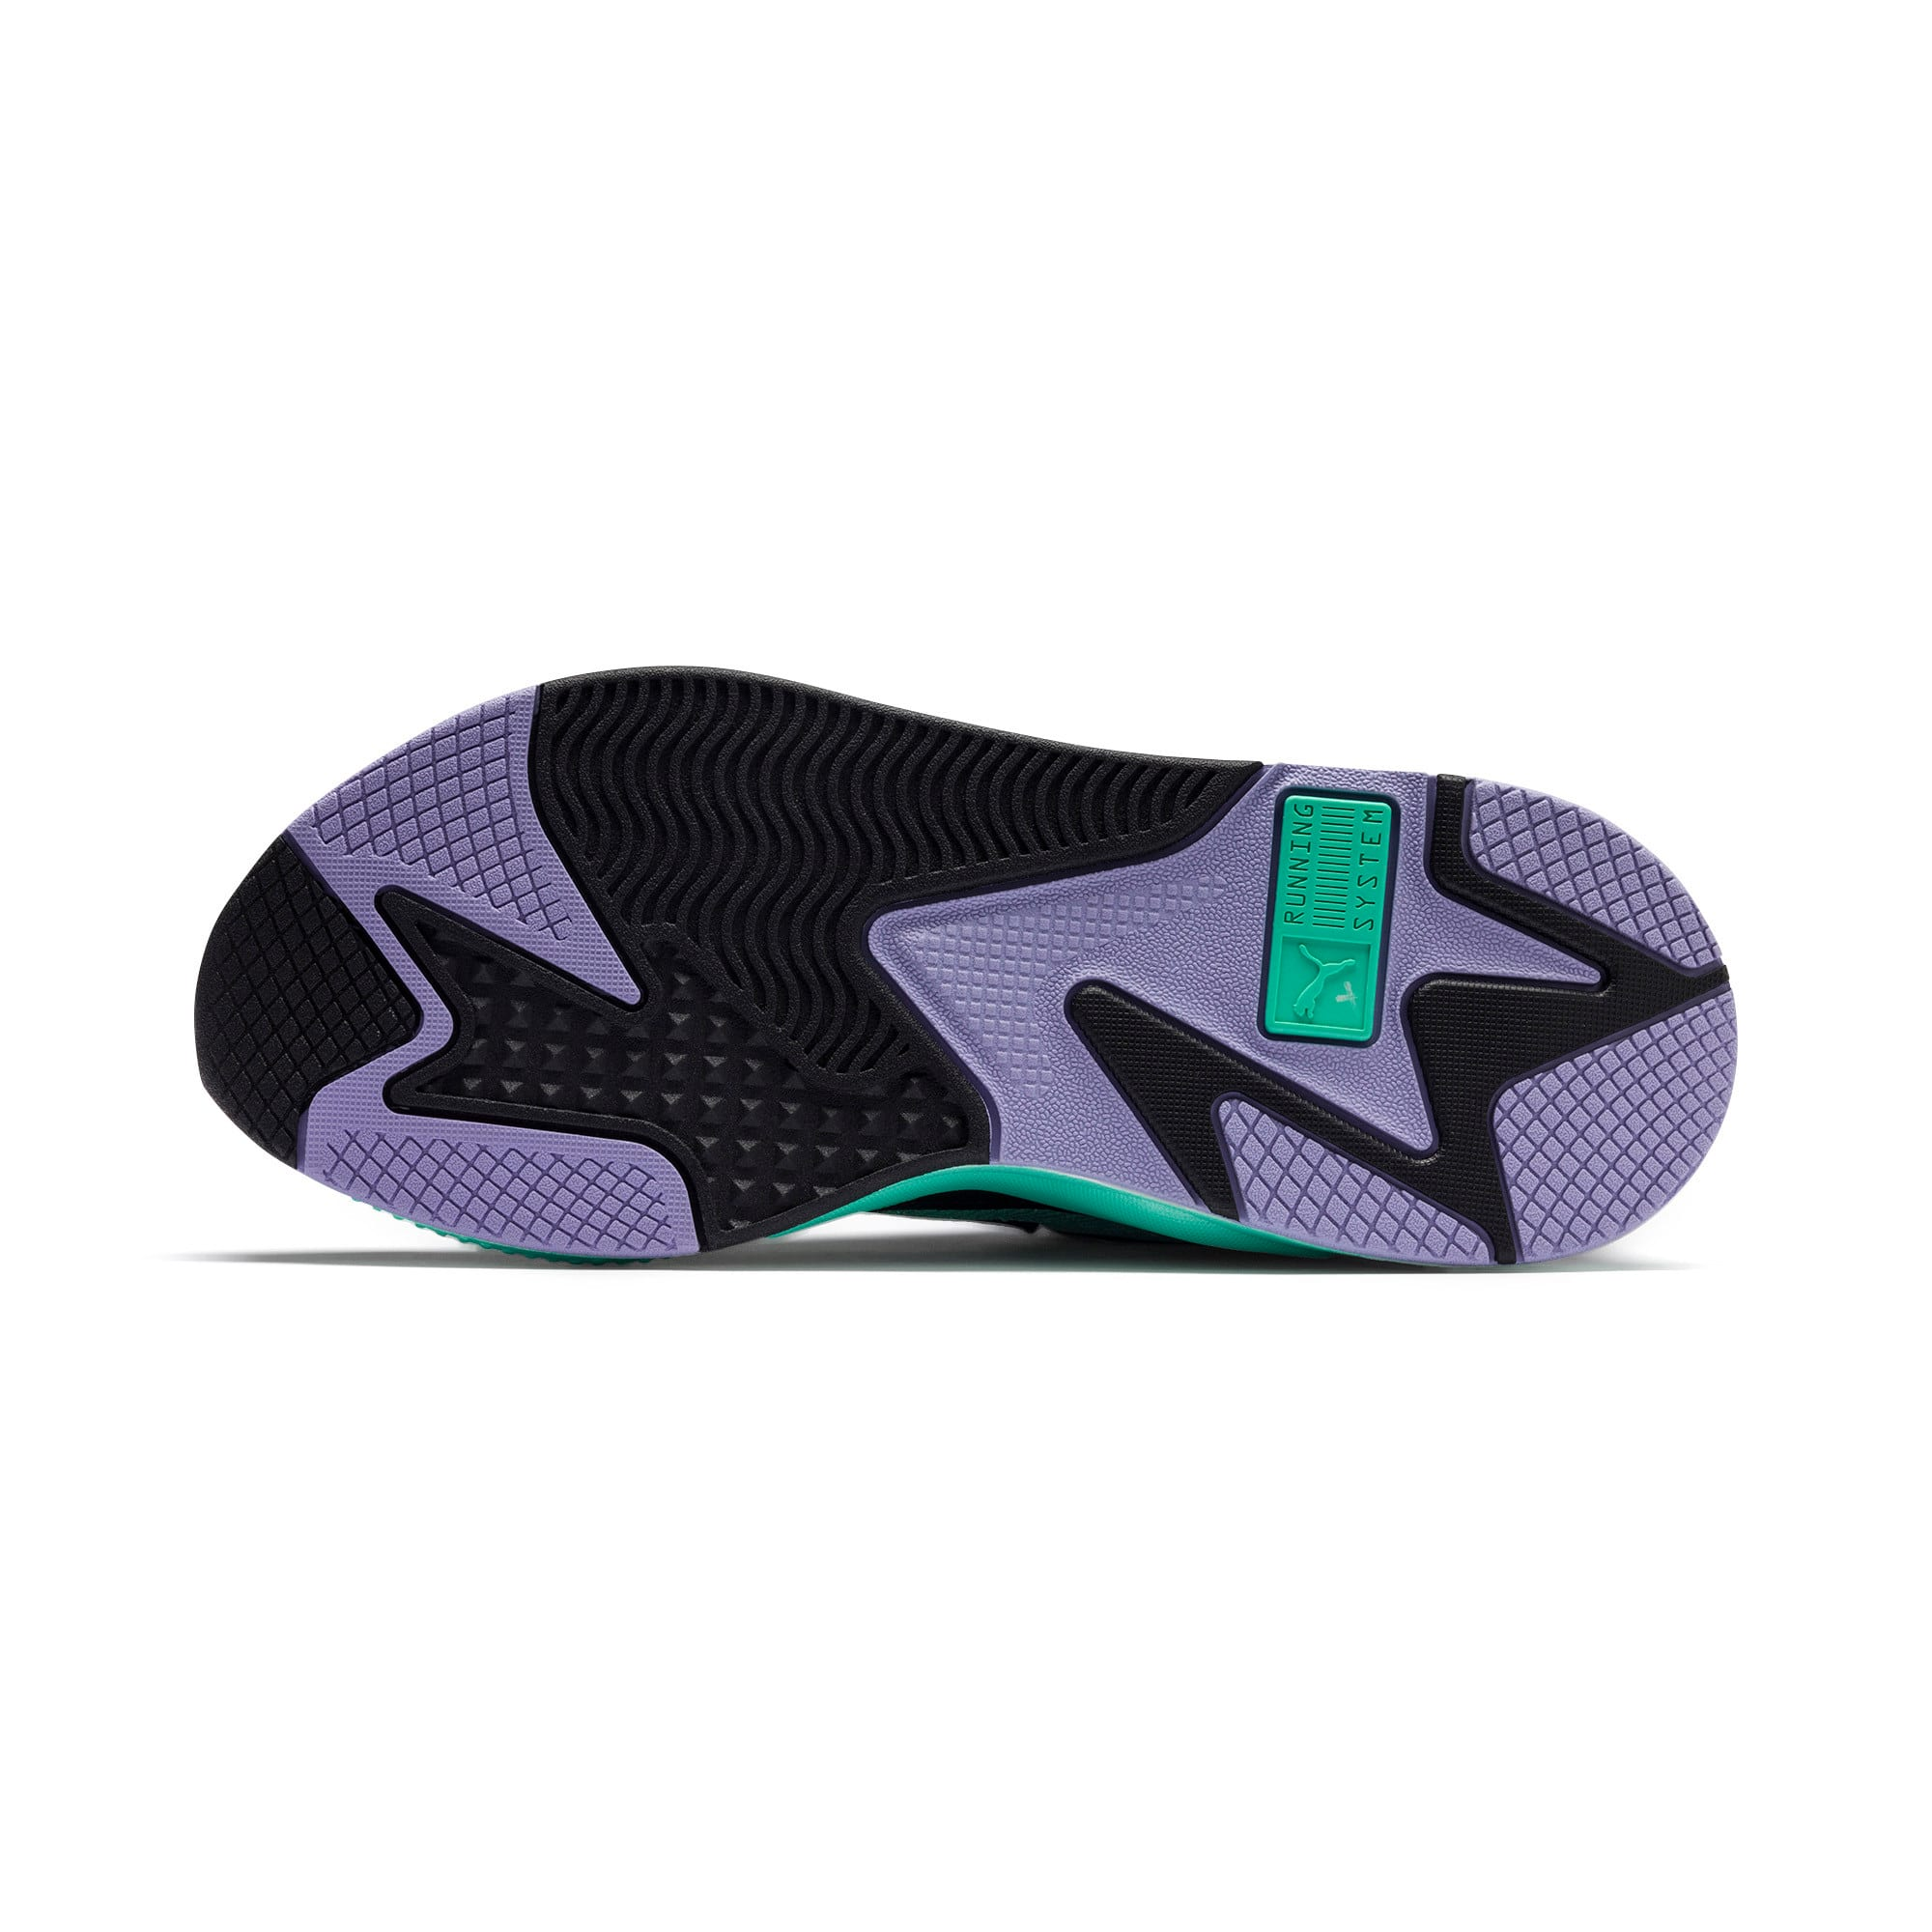 Thumbnail 4 of RS-X Tracks MTV Gradient Gloom Sneakers, Puma Black-Sweet Lavender, medium